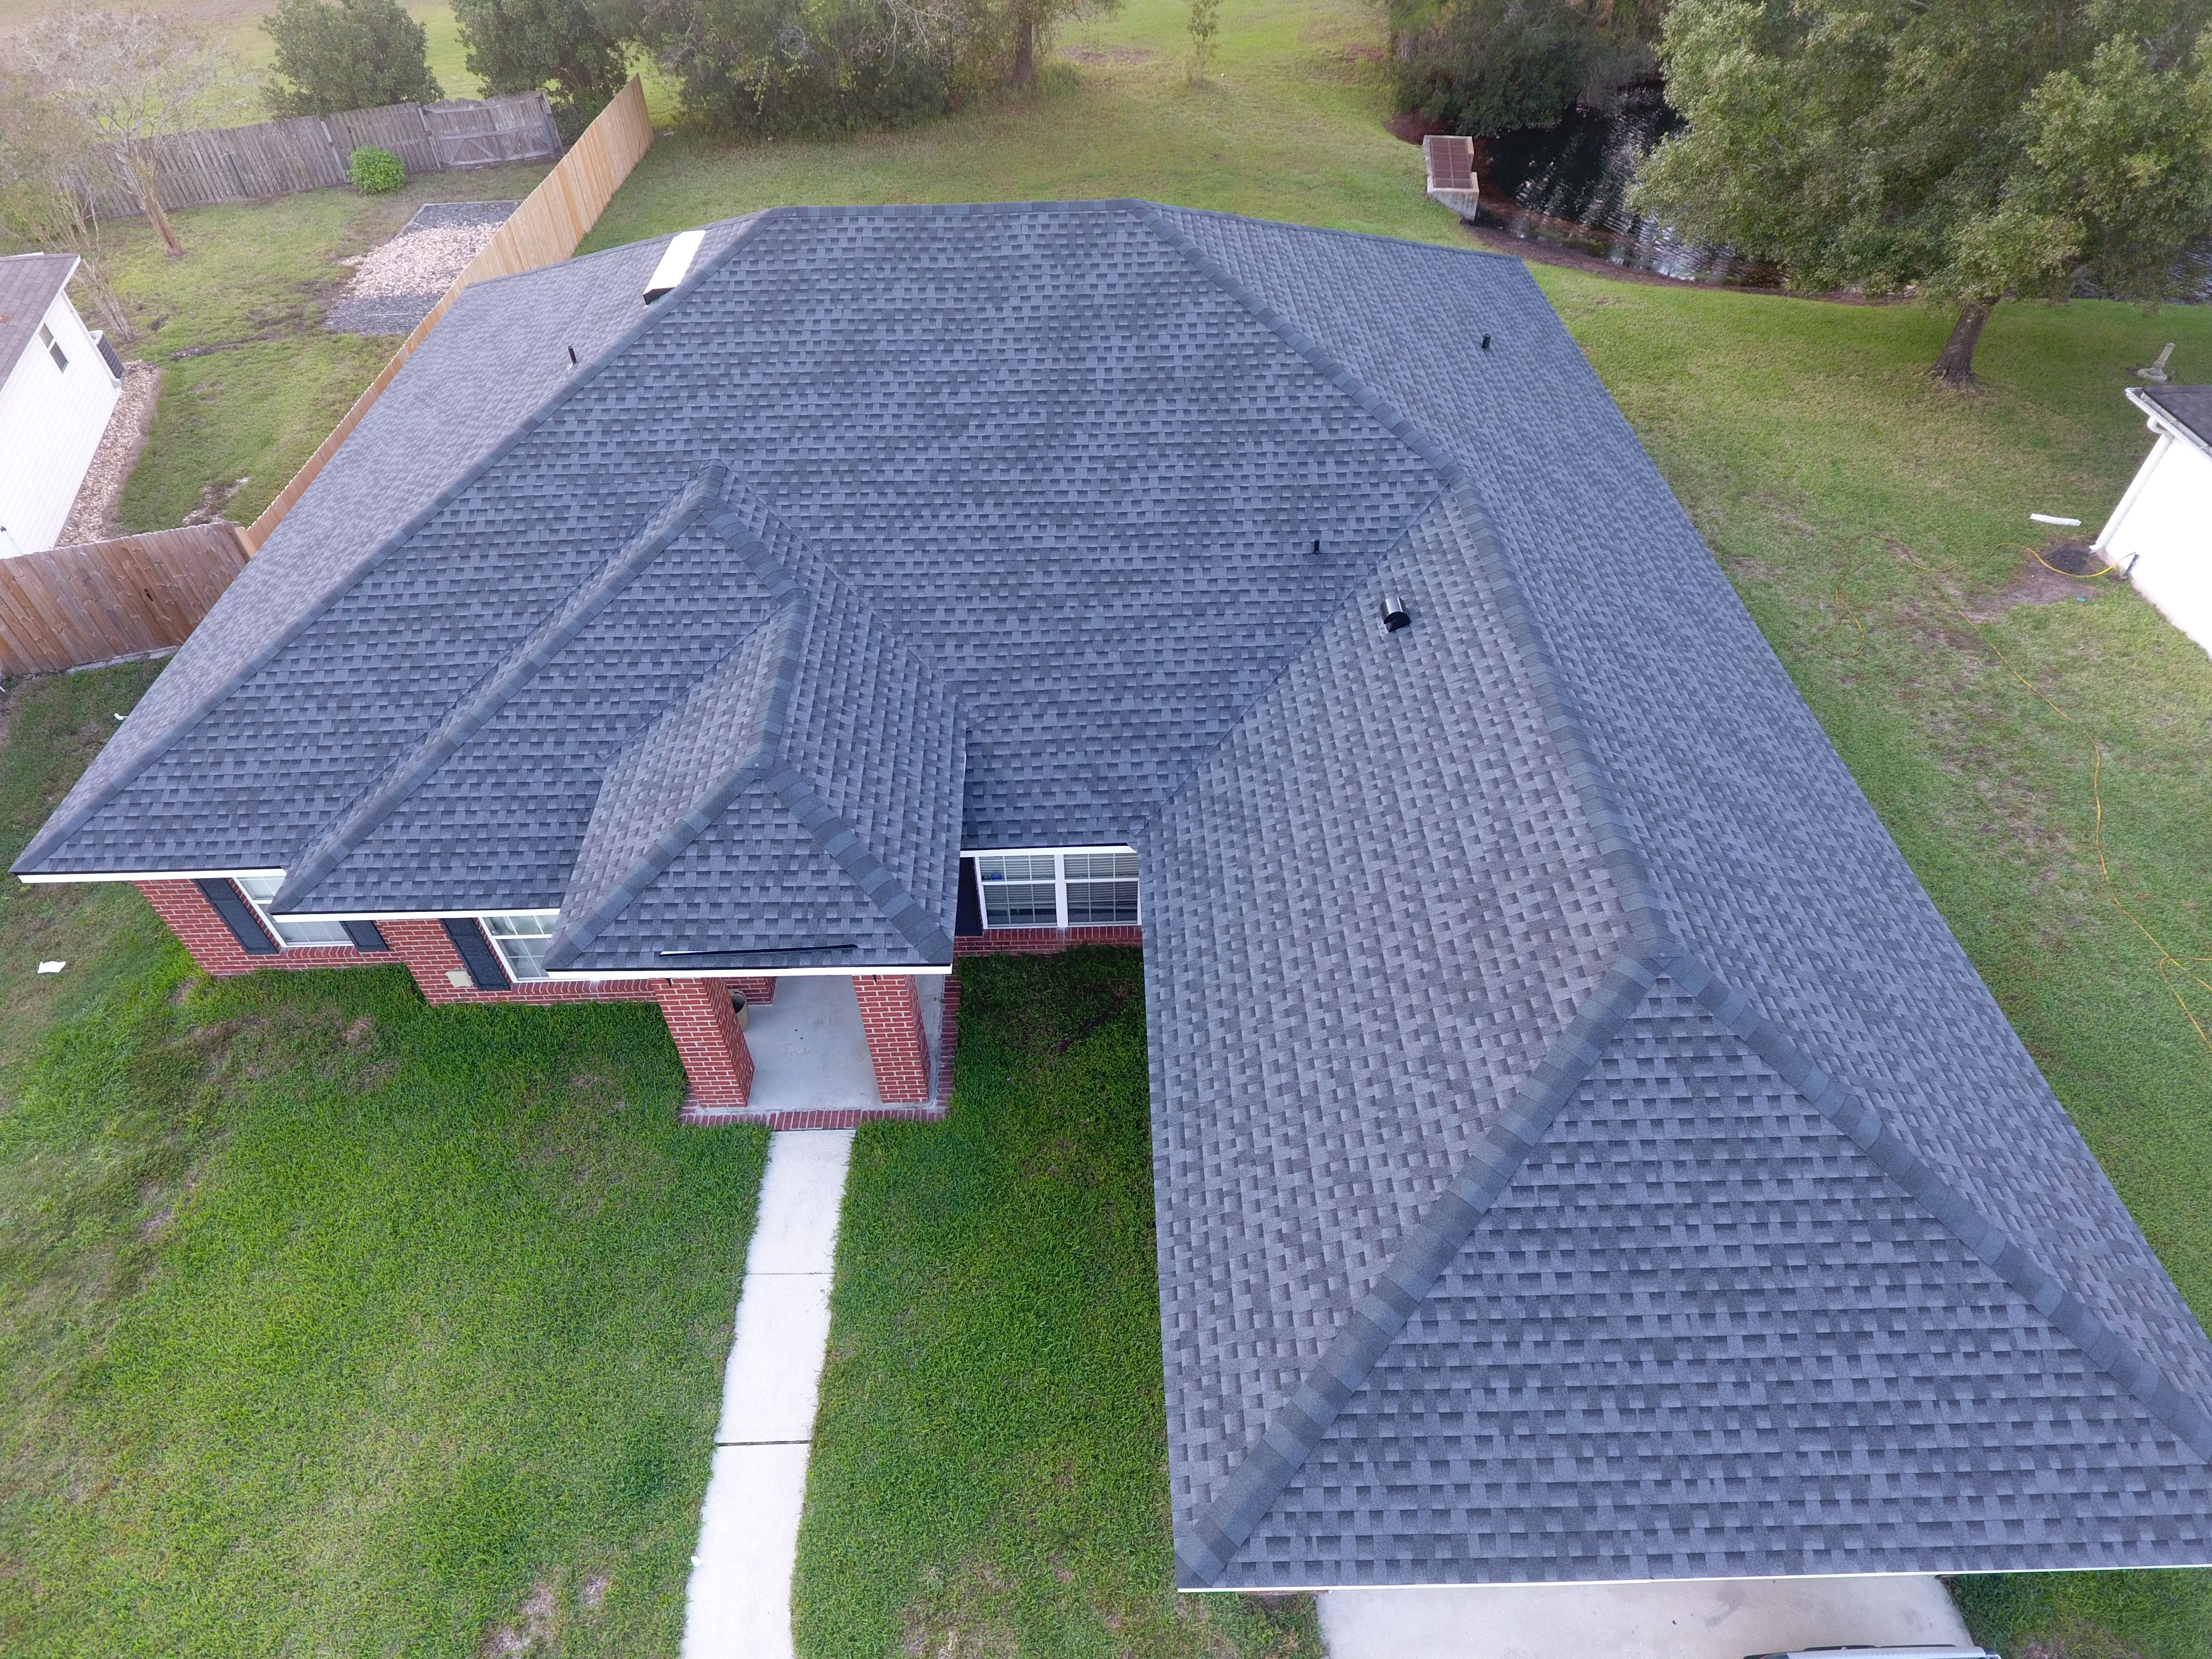 Roof Repair Services Jacksonville Fl Weatherlock Roofing Contractor In 2020 Roof Repair Roofing Contractors Roofing Services